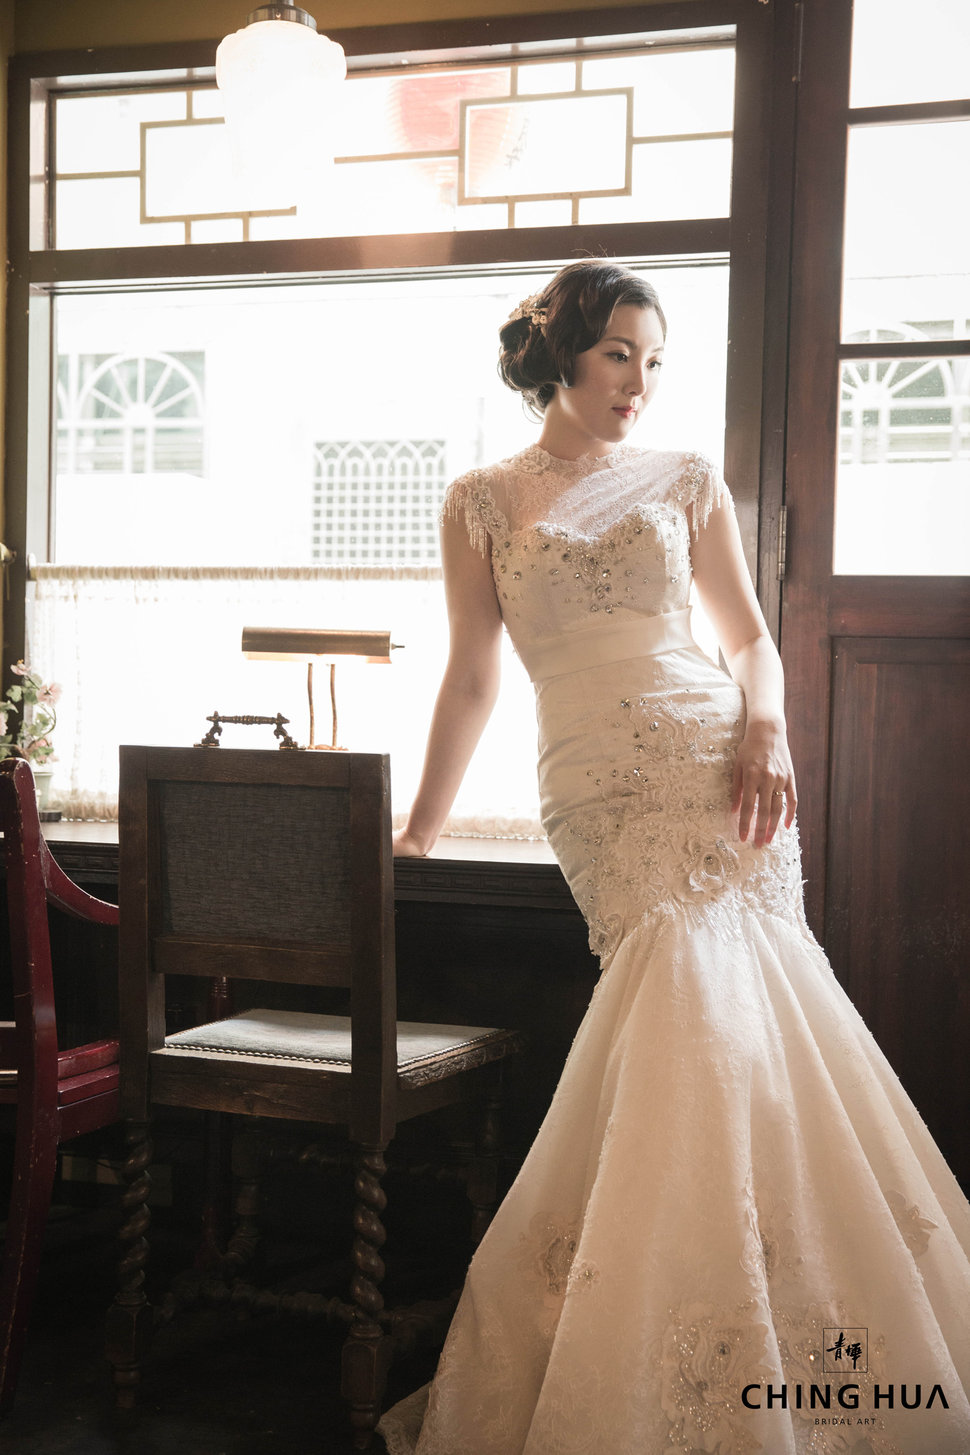 (編號:433080) - 青樺婚紗CHINGHUA - 結婚吧